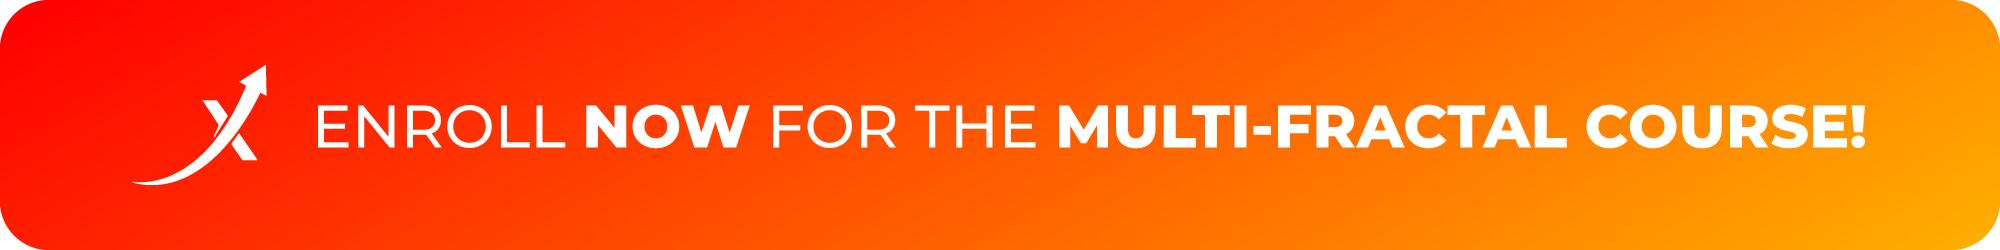 MFM banner